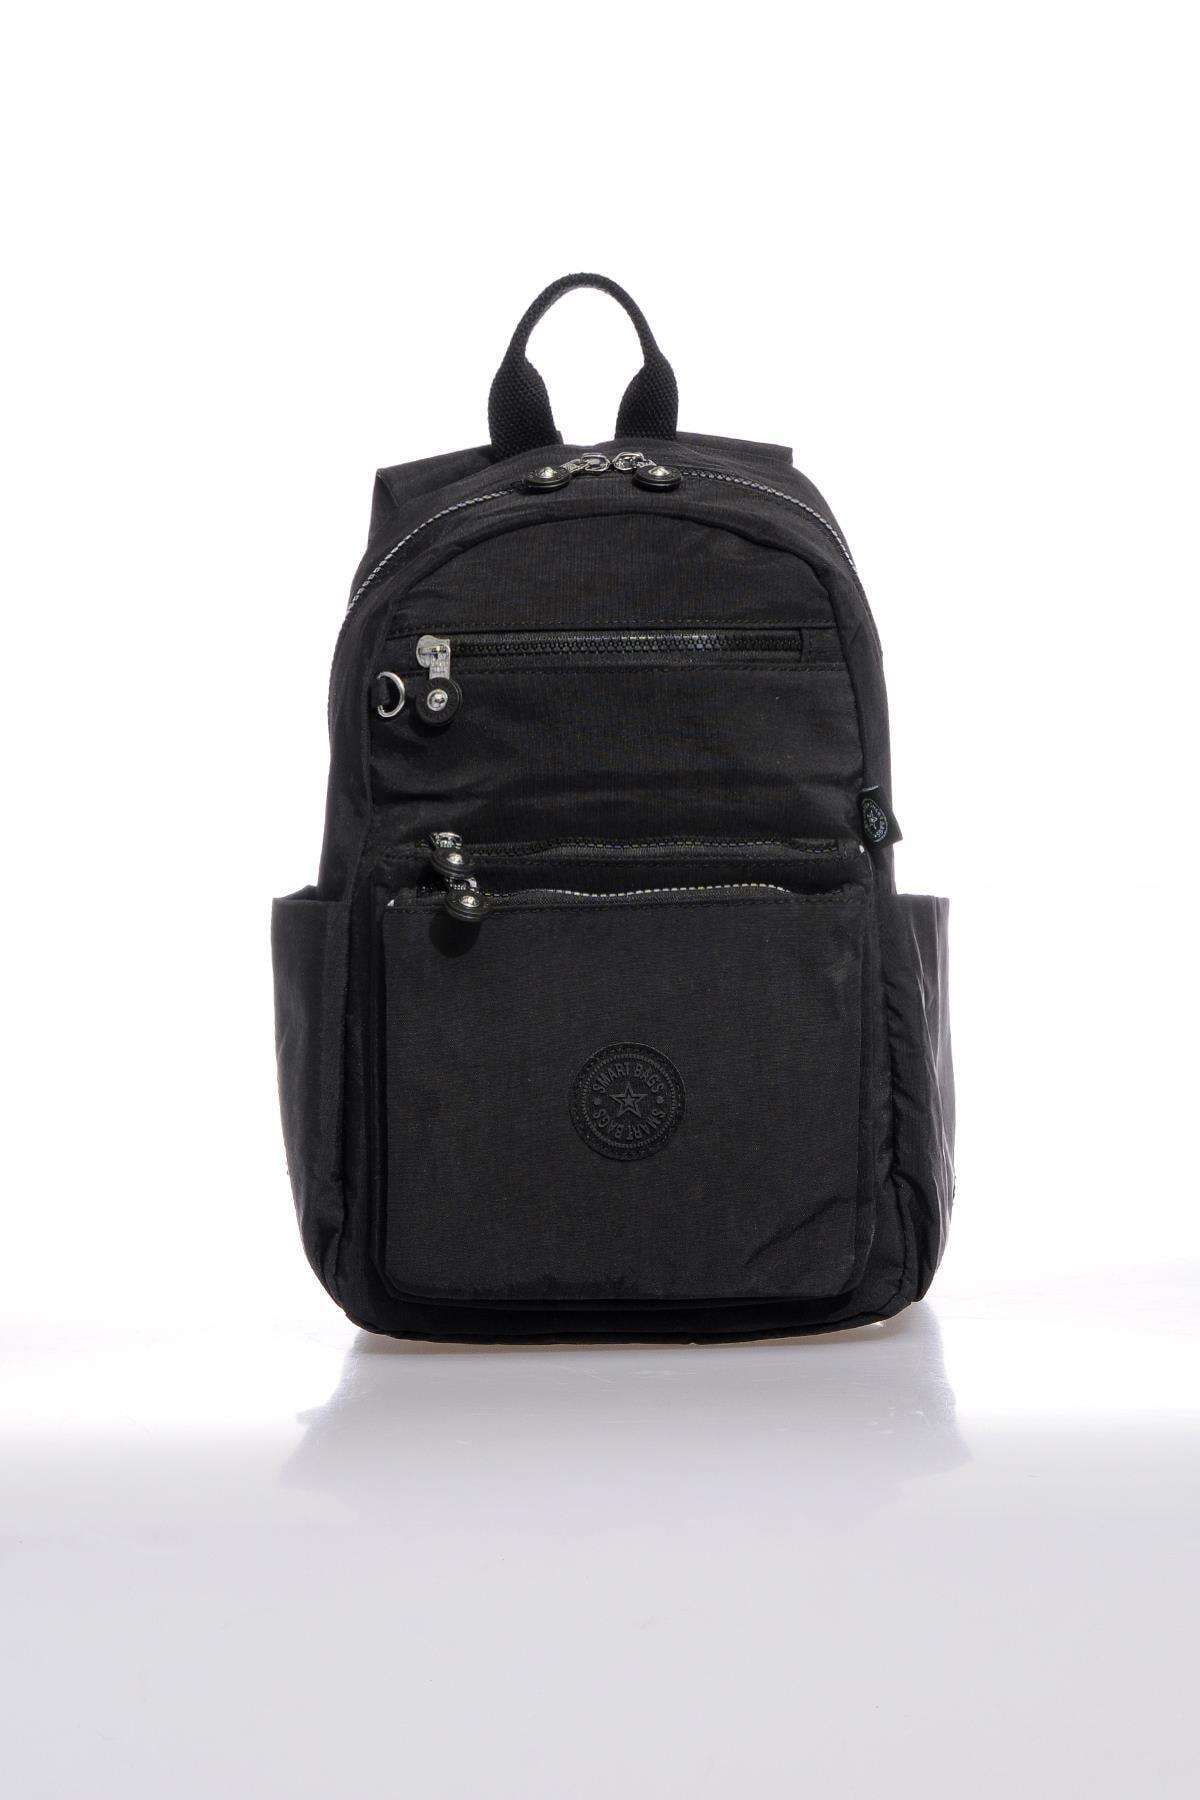 SMART BAGS Smb3068-0001 Siyah Kadın Sırt Çantası 1